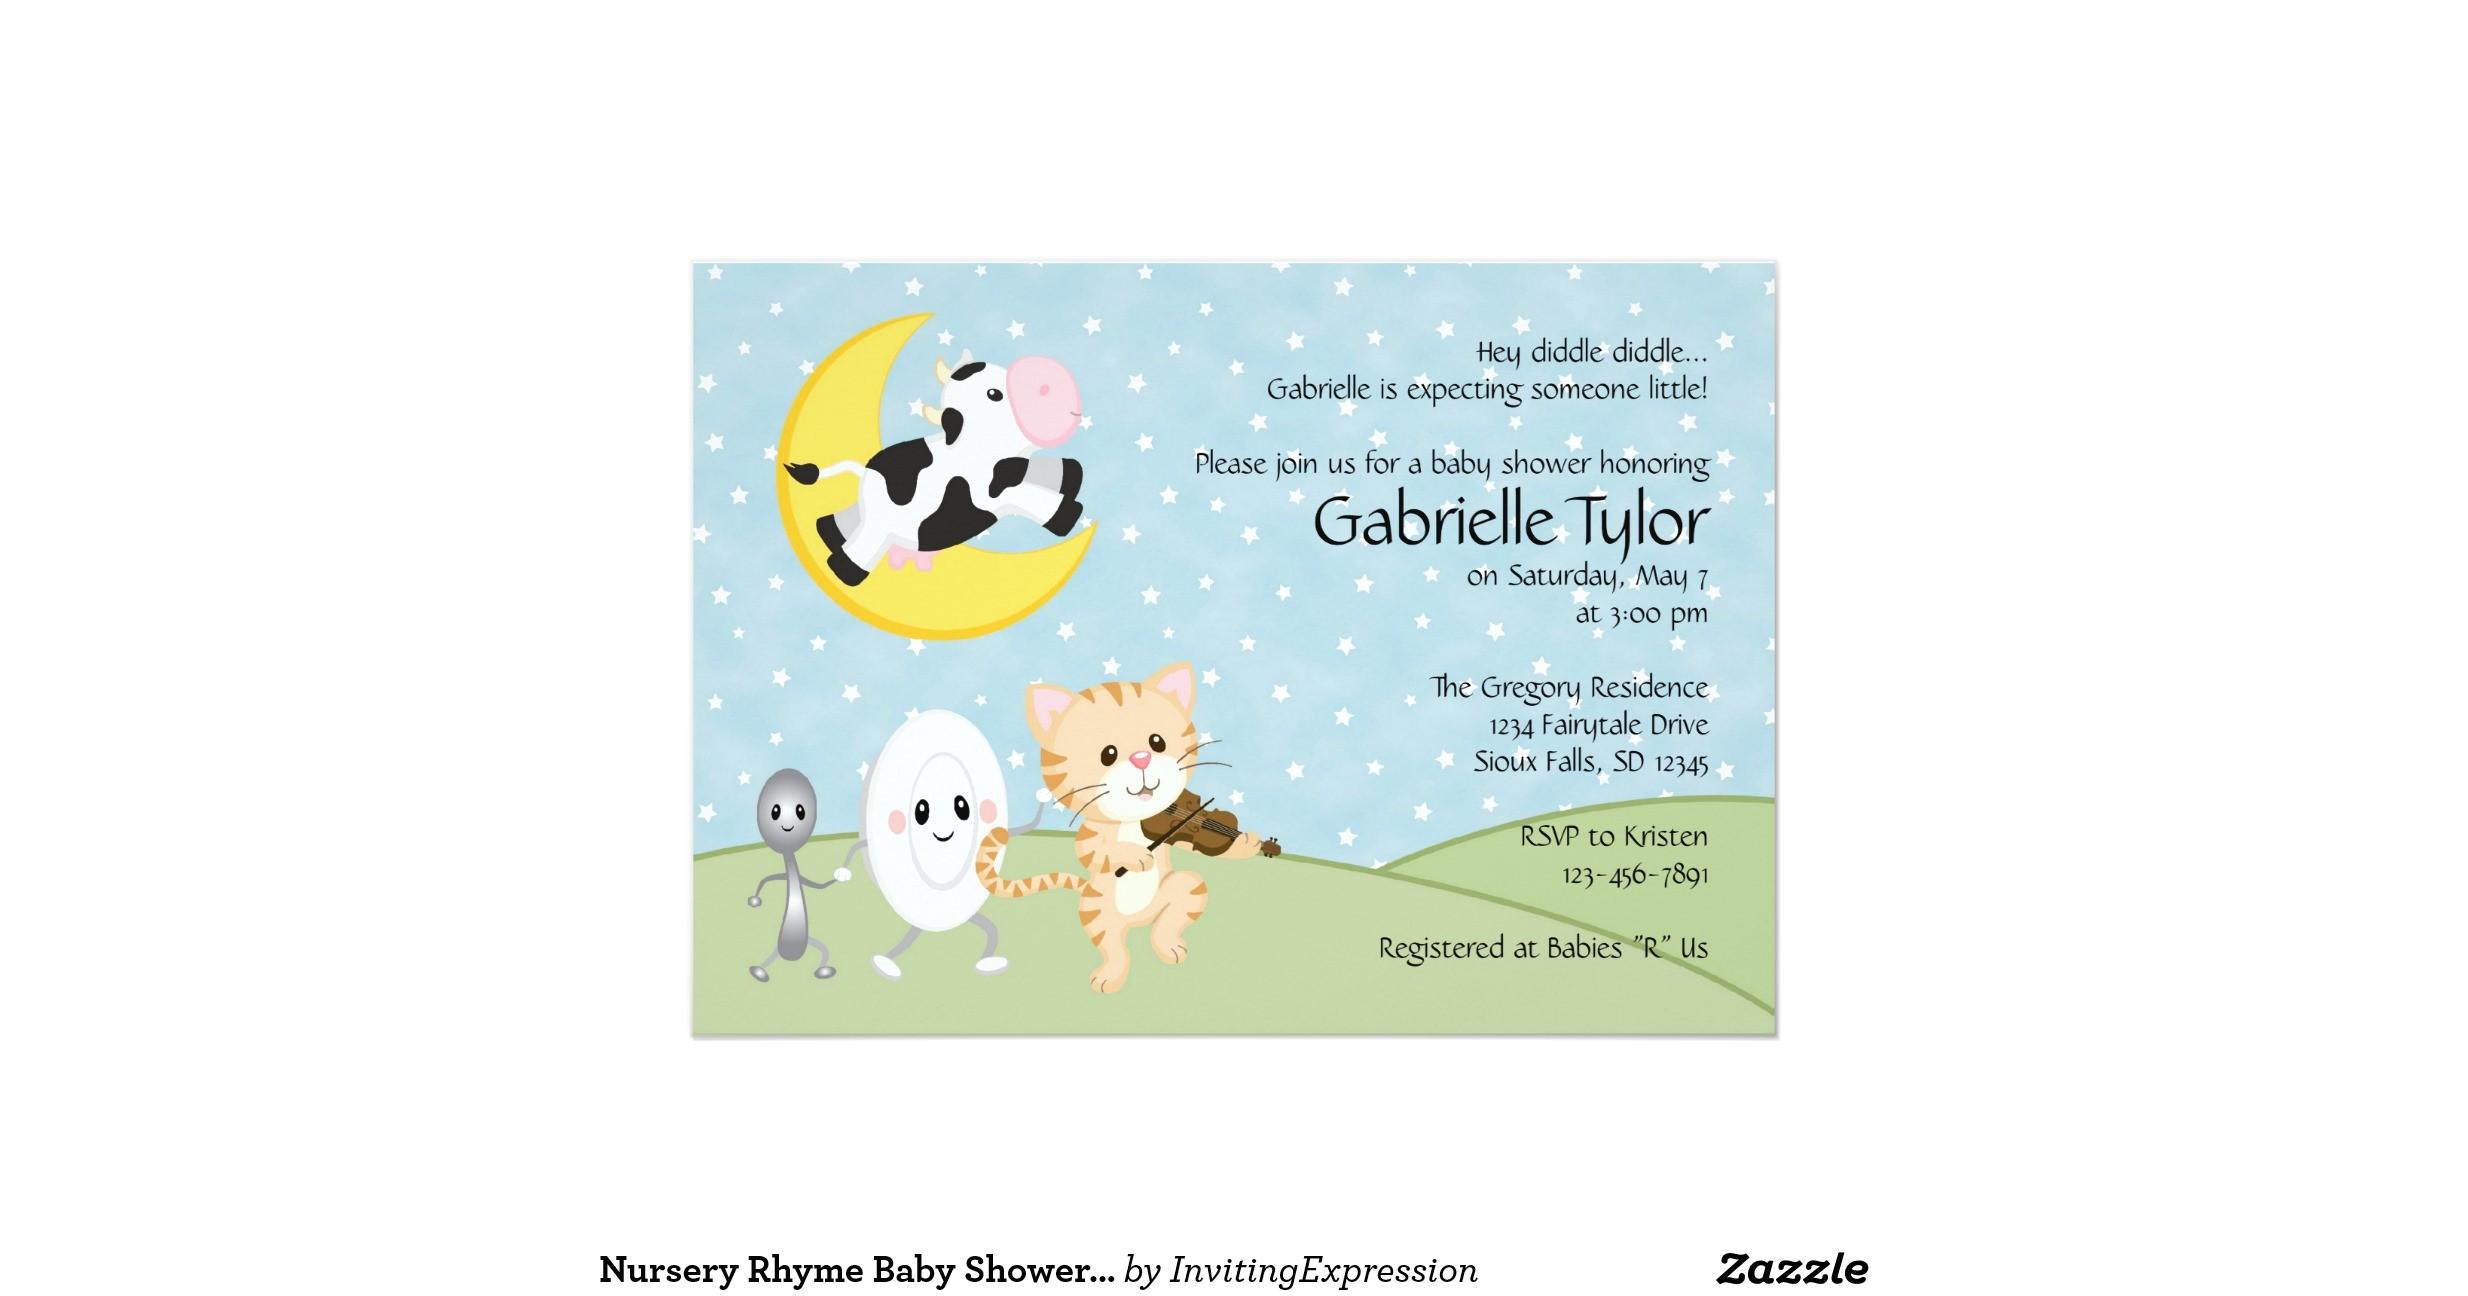 Rhyming Baby Shower Invitations Nursery Rhyme Baby Shower Invitations